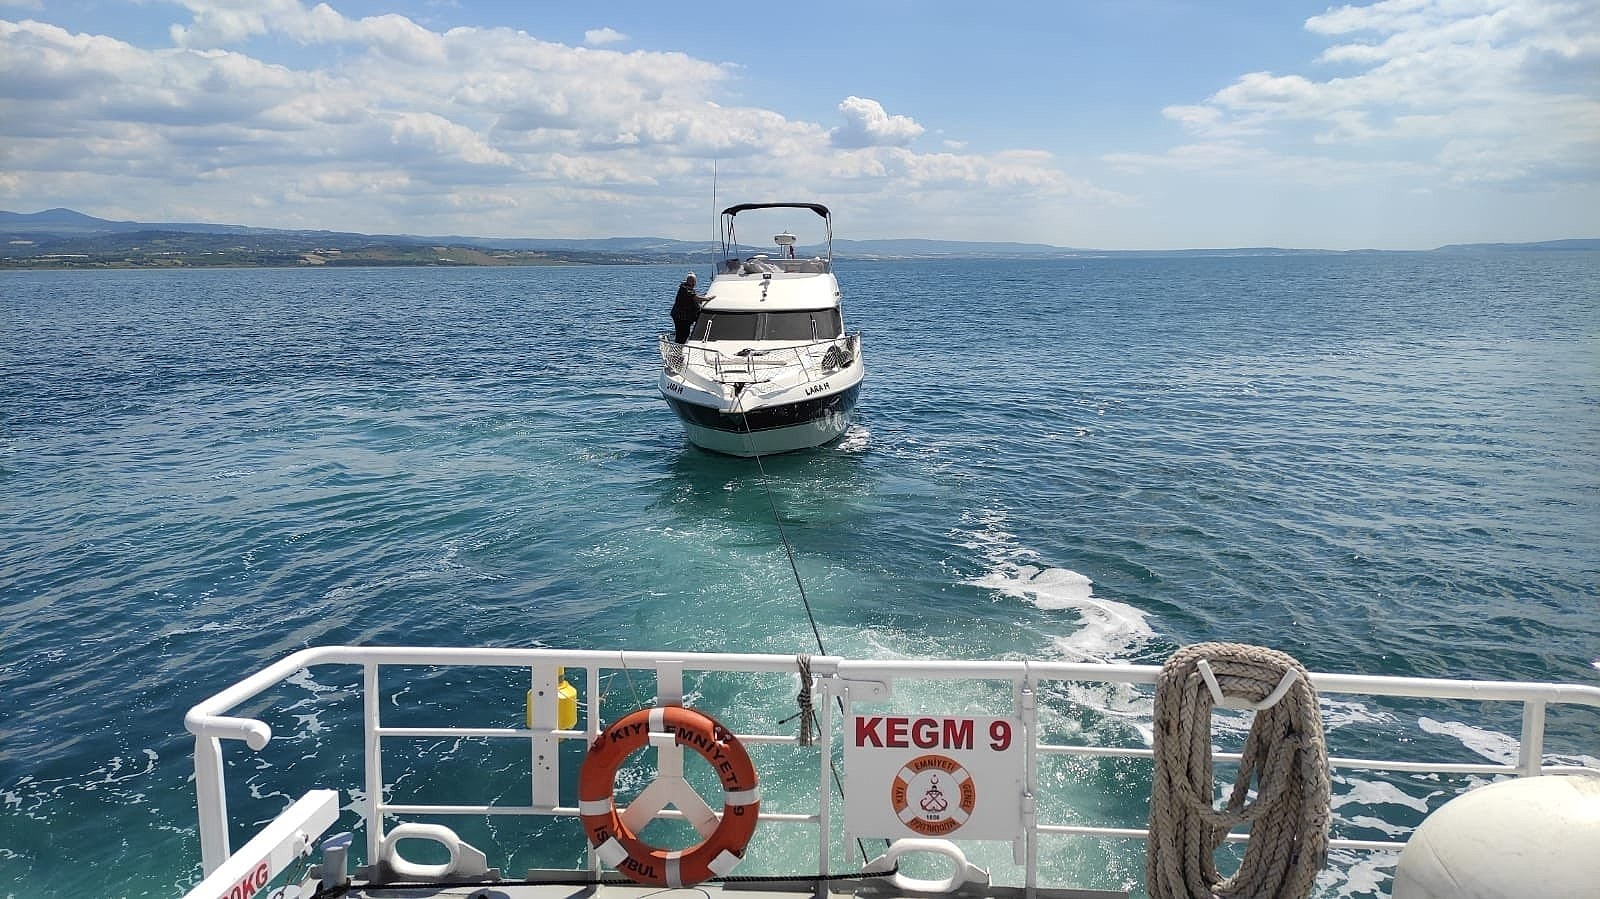 2021/06/canakkale-bogazinda-arizalanan-tekneye-kegm-mudahale-etti-20210604AW33-1.jpg